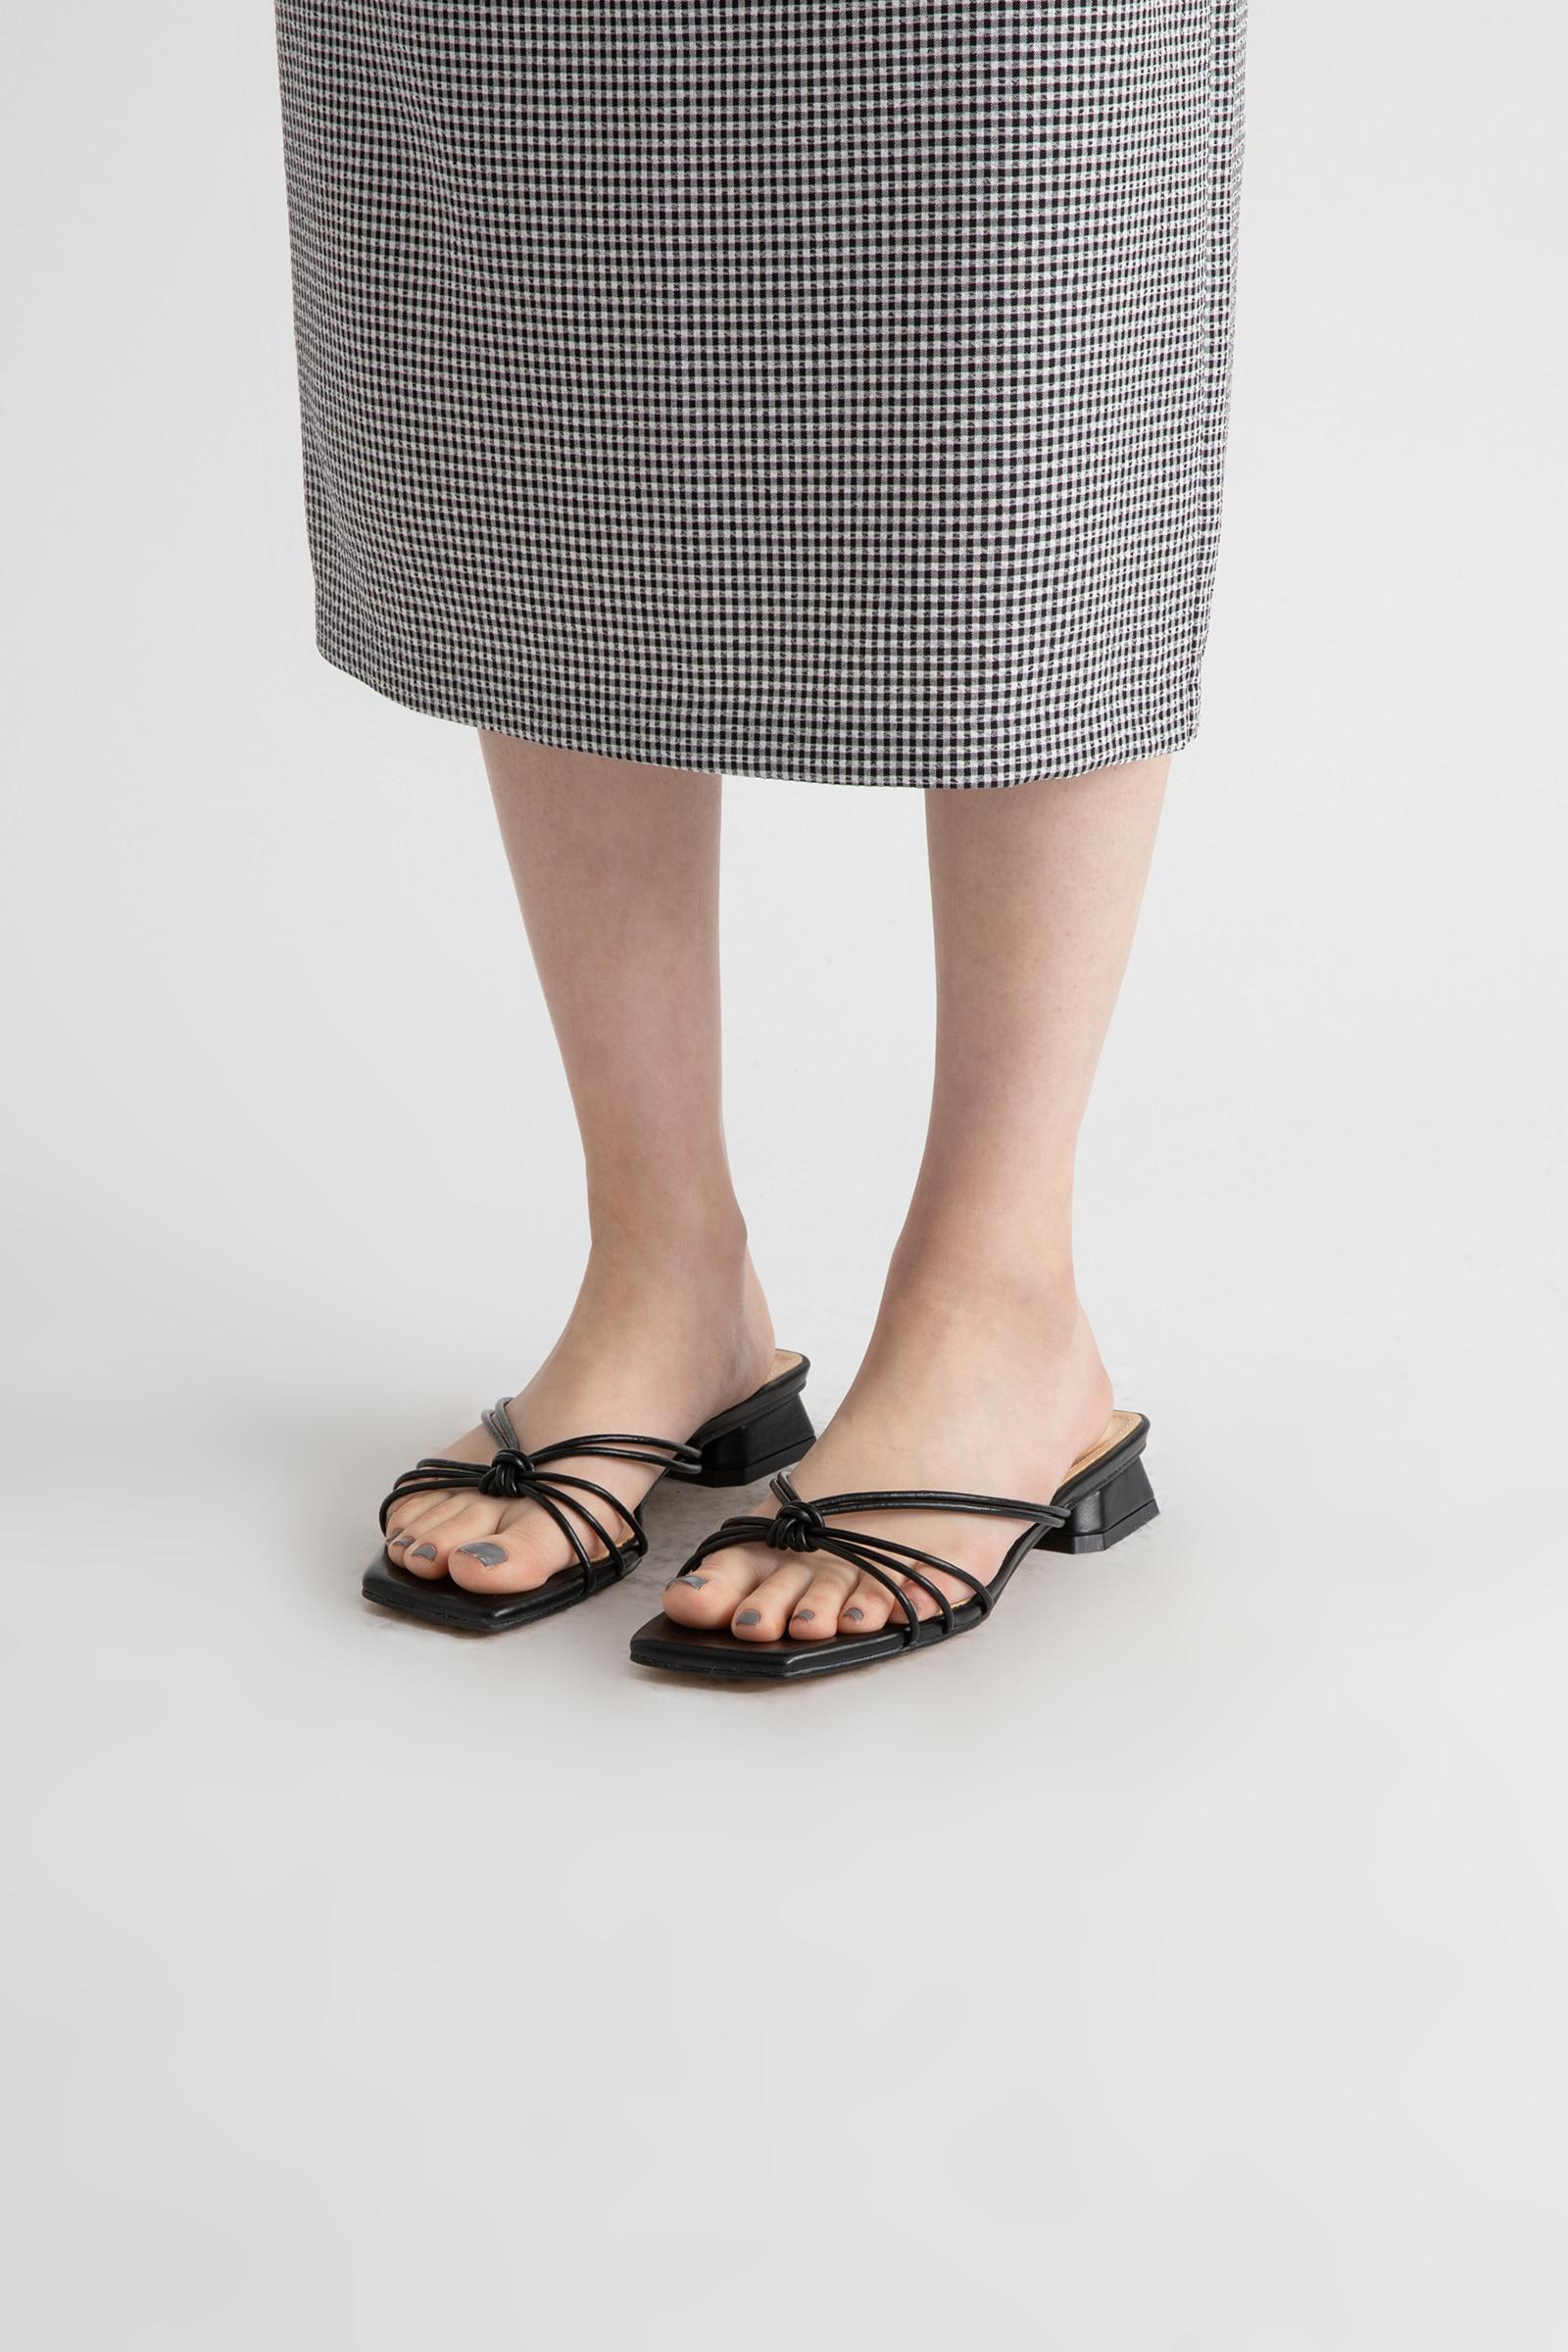 Cha Cha Twist Low Heel Sandals